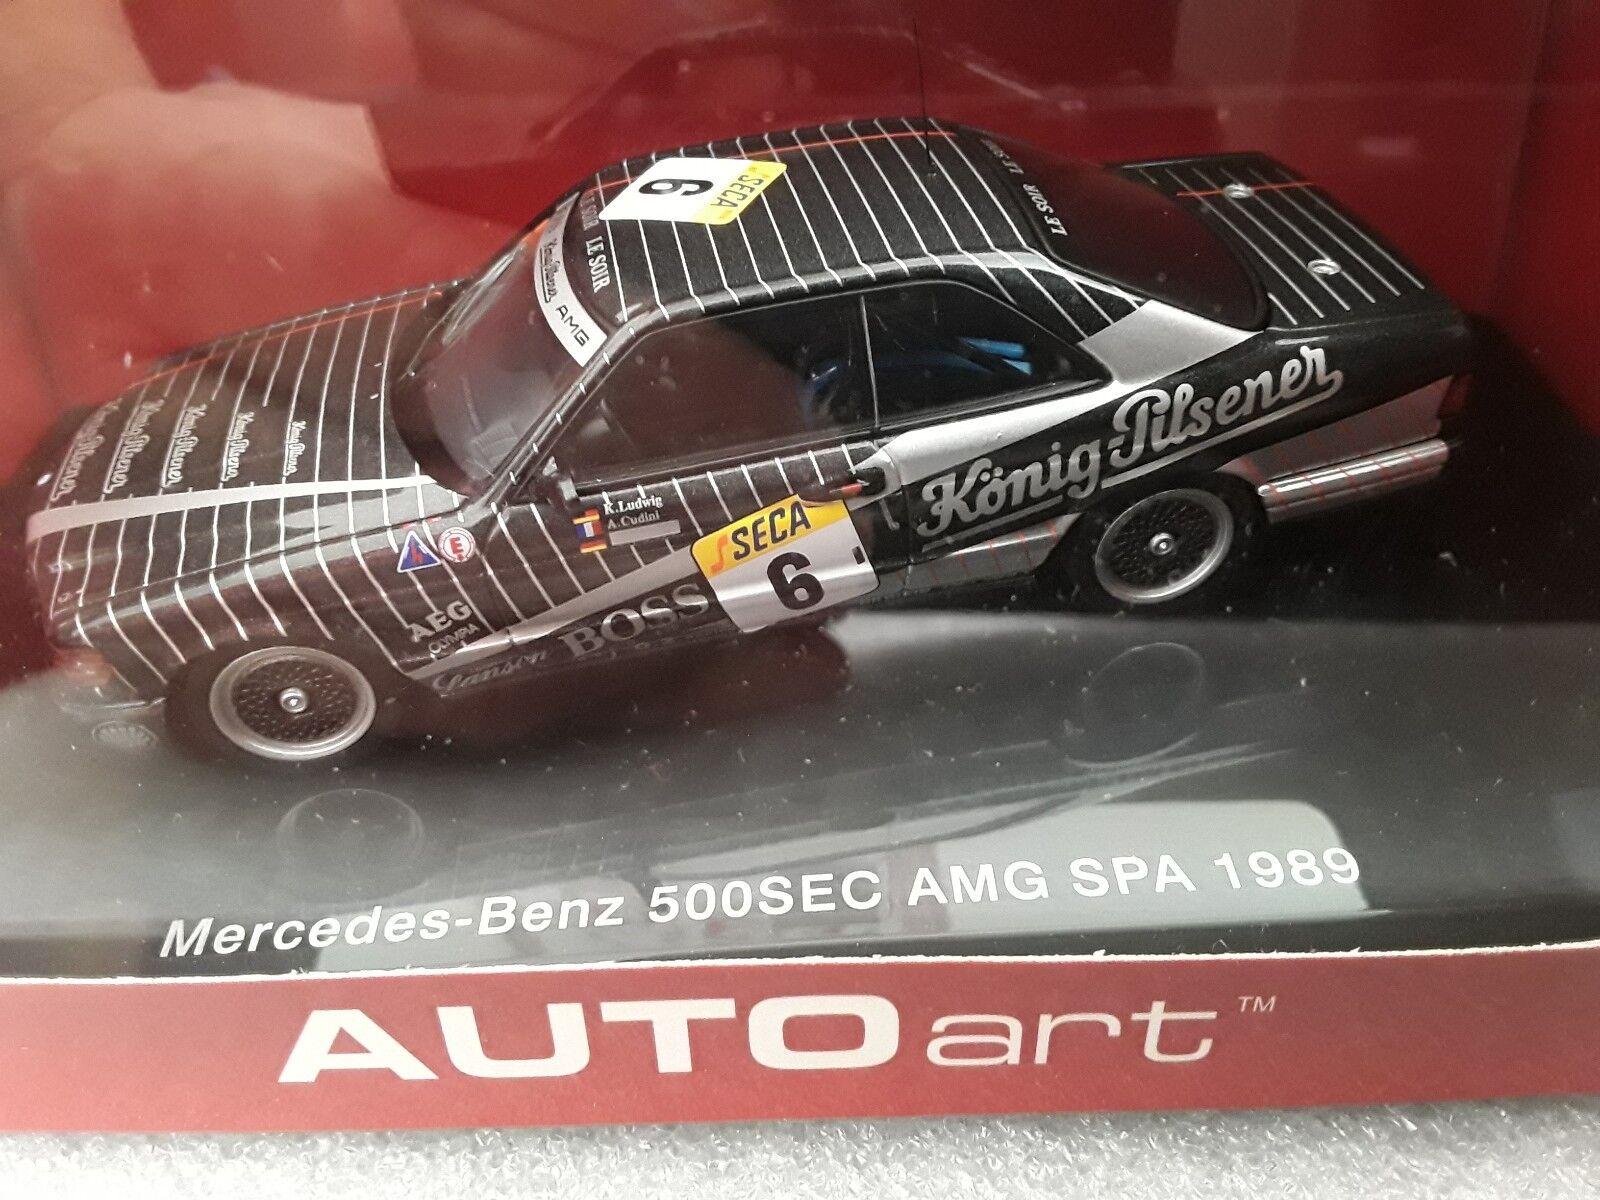 Mercedes-Benz 500sec AMG  Spa 1989  6  K. Ludwig A. CUDINI  1 43 AUTOart